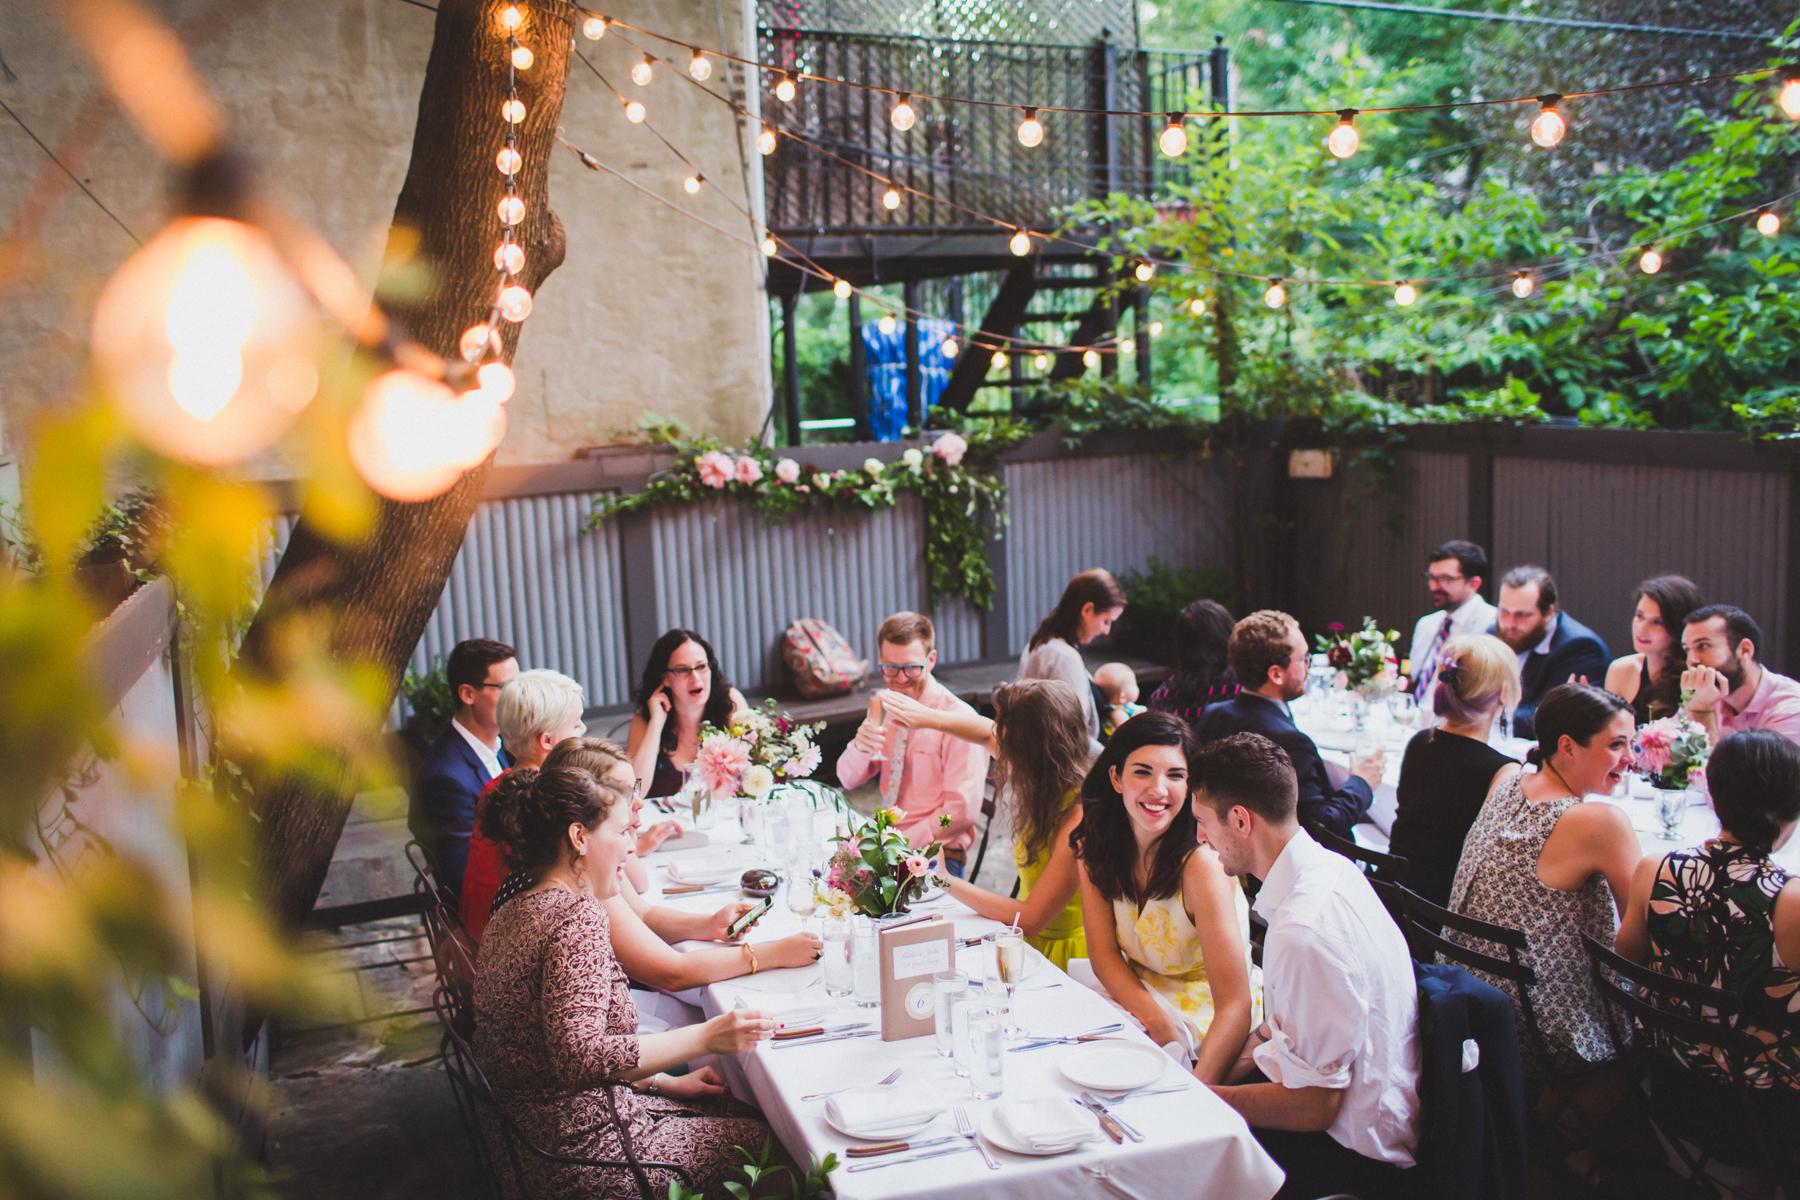 ICI-Restaurant-Fort-Greene-Brooklyn-Intimate-Documentary-Wedding-Photography-Elvira-Kalviste-85.jpg